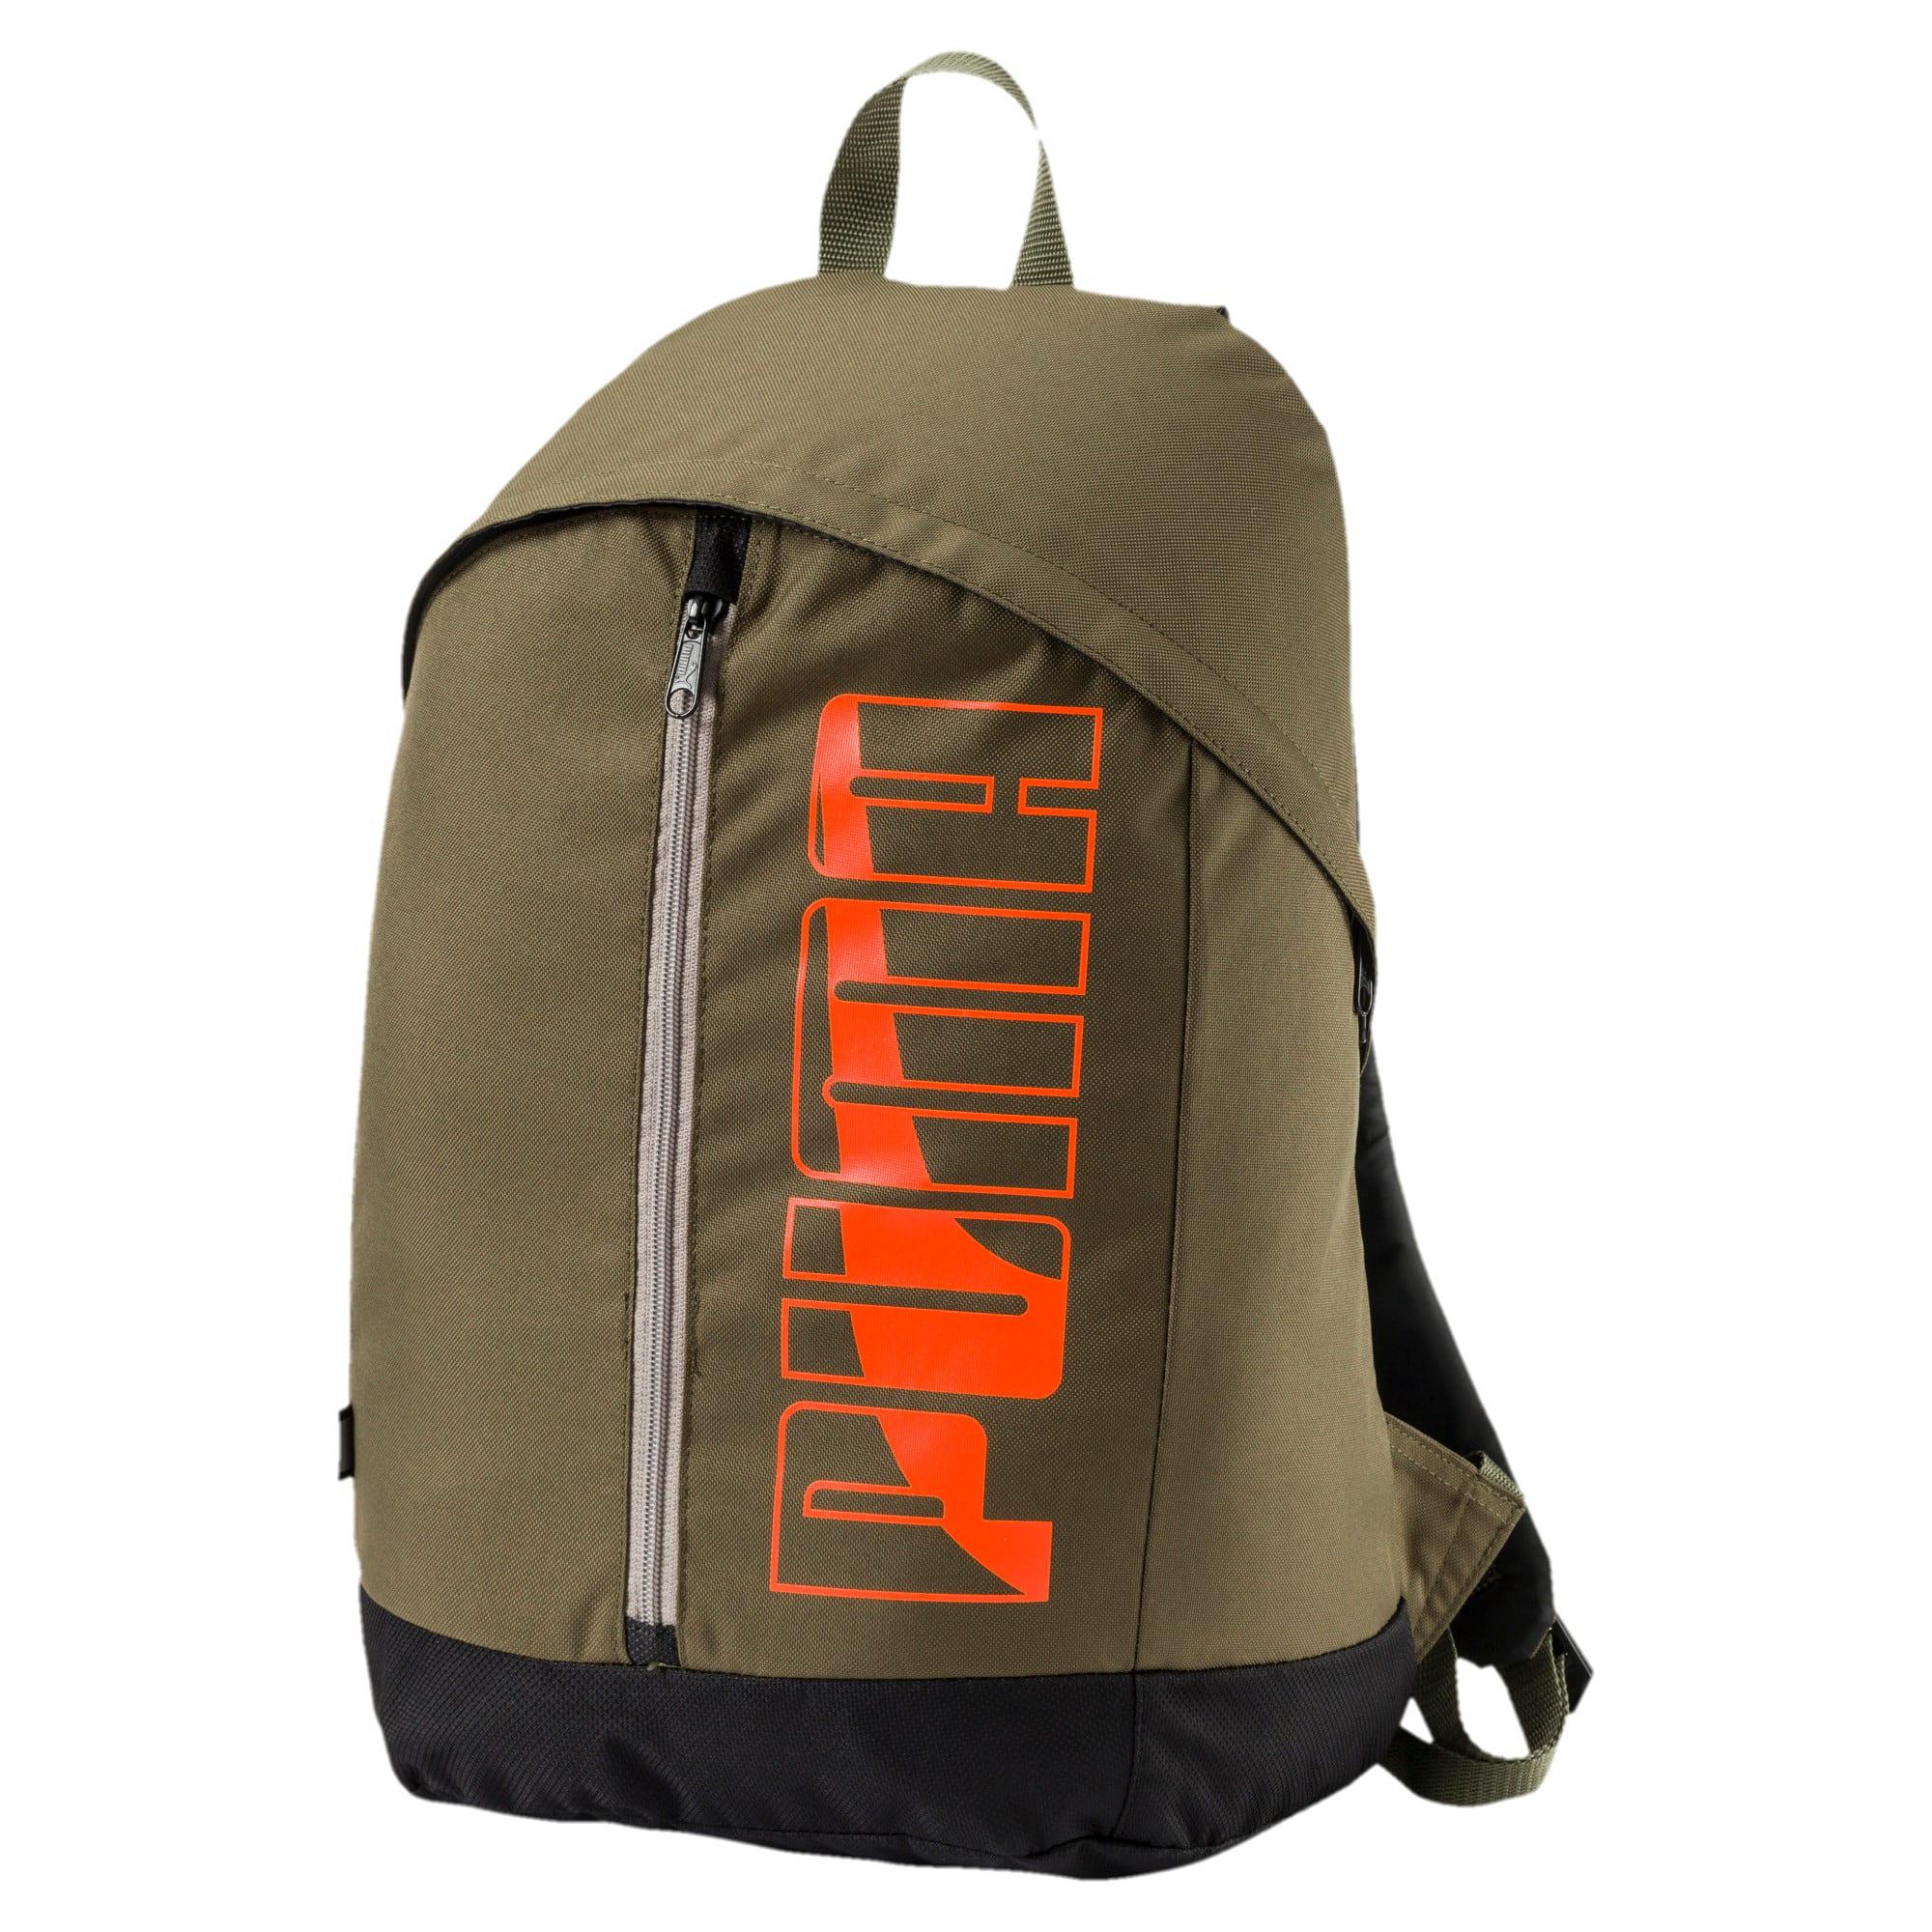 Thumbnail 1 of Pioneer Backpack II, Olive Night, medium-IND